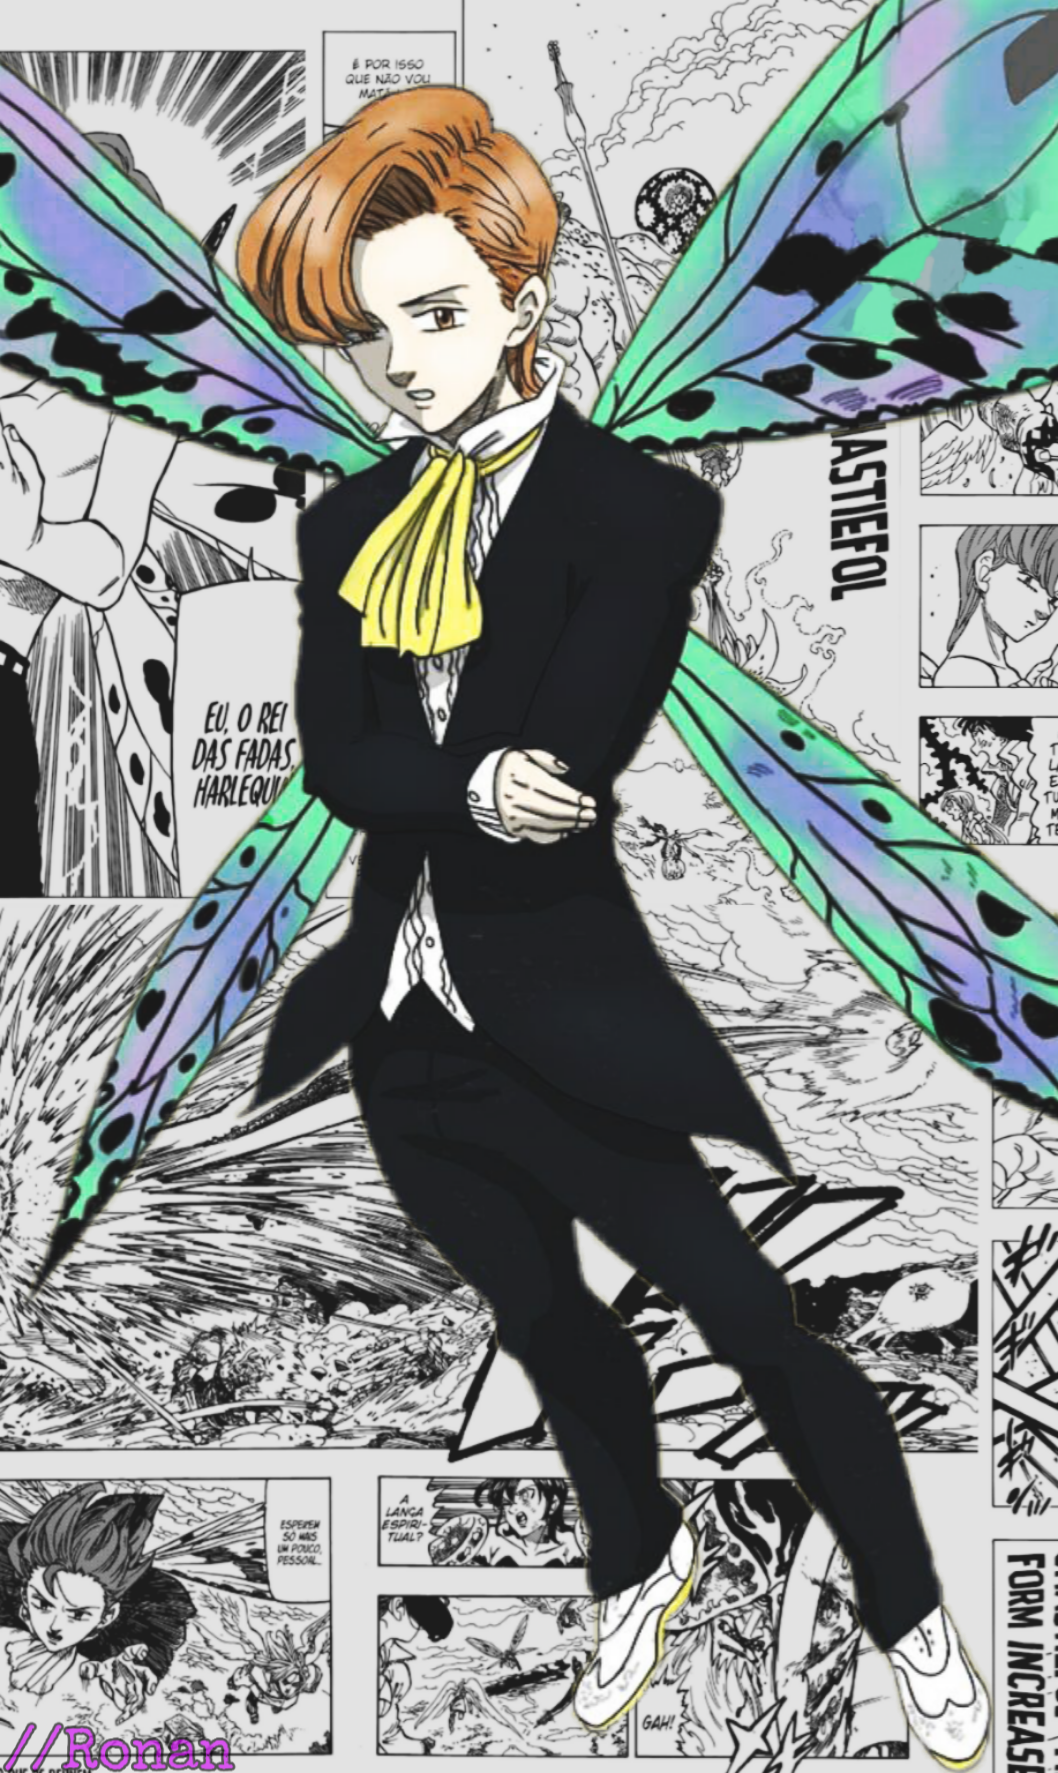 King Nanatsu No Taizai : nanatsu, taizai, Nanatsu, Taizai, Manga, Seven, Deadly, Anime,, Sins,, Anime, Sketch